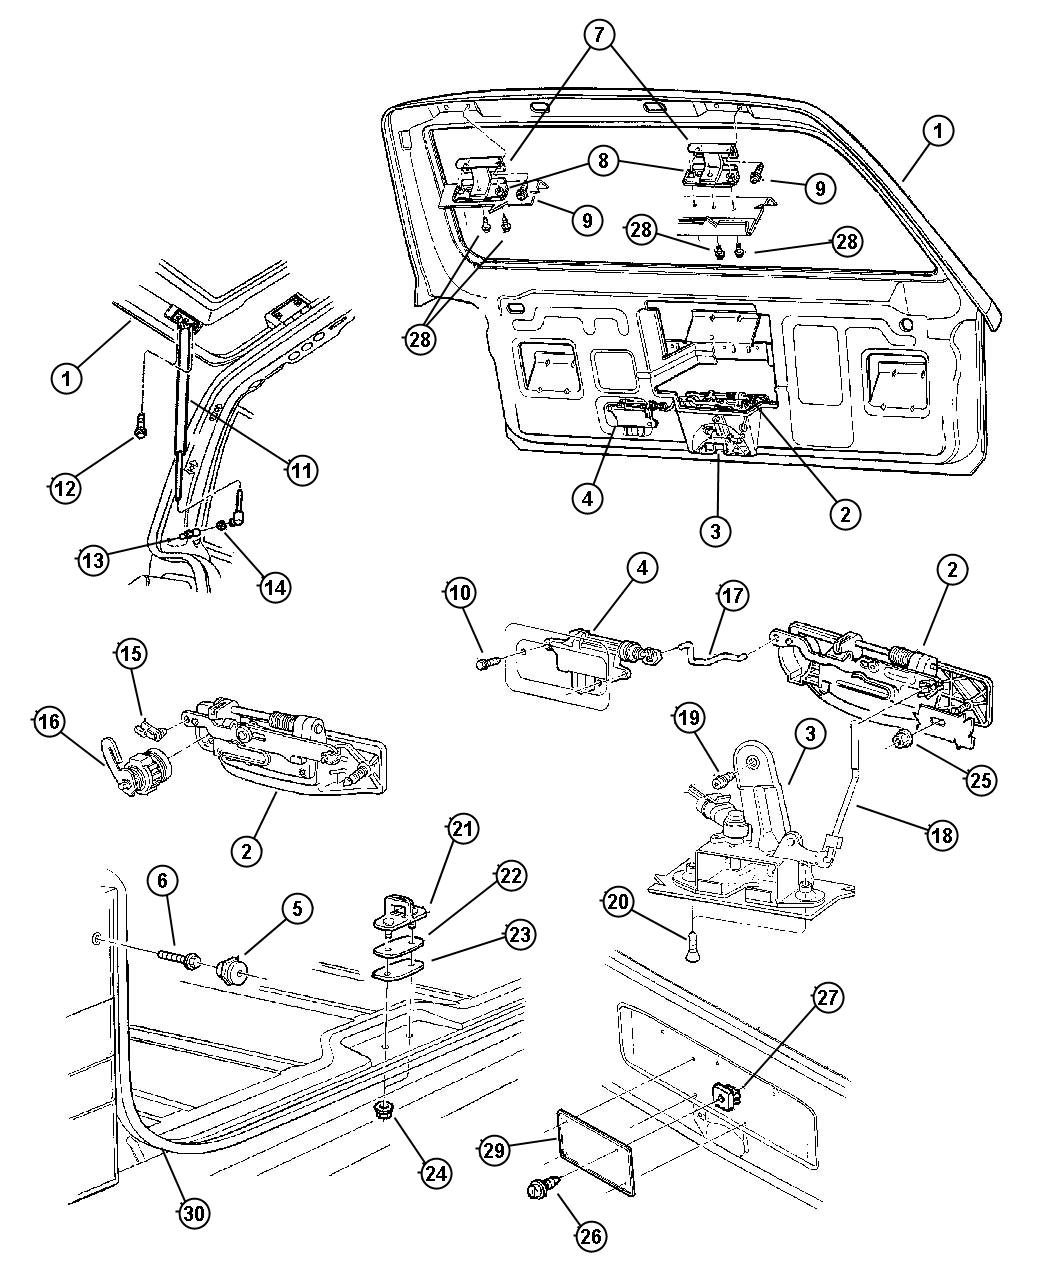 2000 jeep grand cherokee brake light wiring diagram yamaha g1 electric golf cart fog lights imageresizertool com